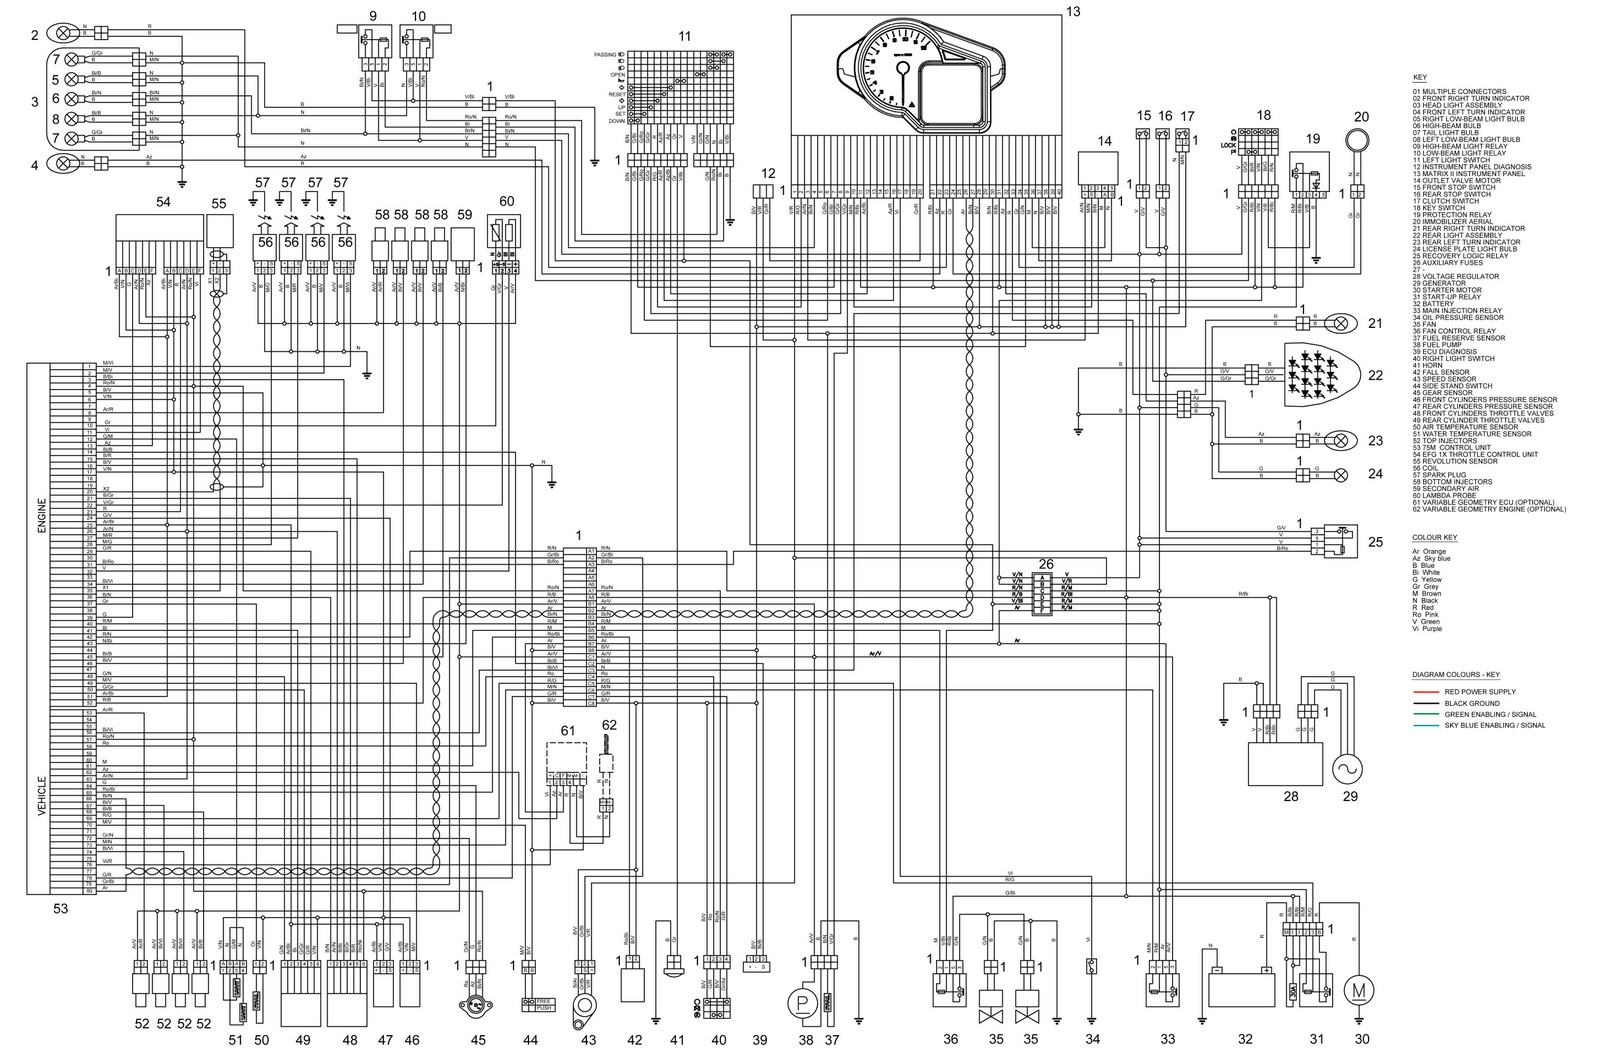 rsv4 wiring diagram motor gp photos aprilia rsv4 wiring diagram aprilia rsv4 wiring diagram [ 1600 x 1062 Pixel ]